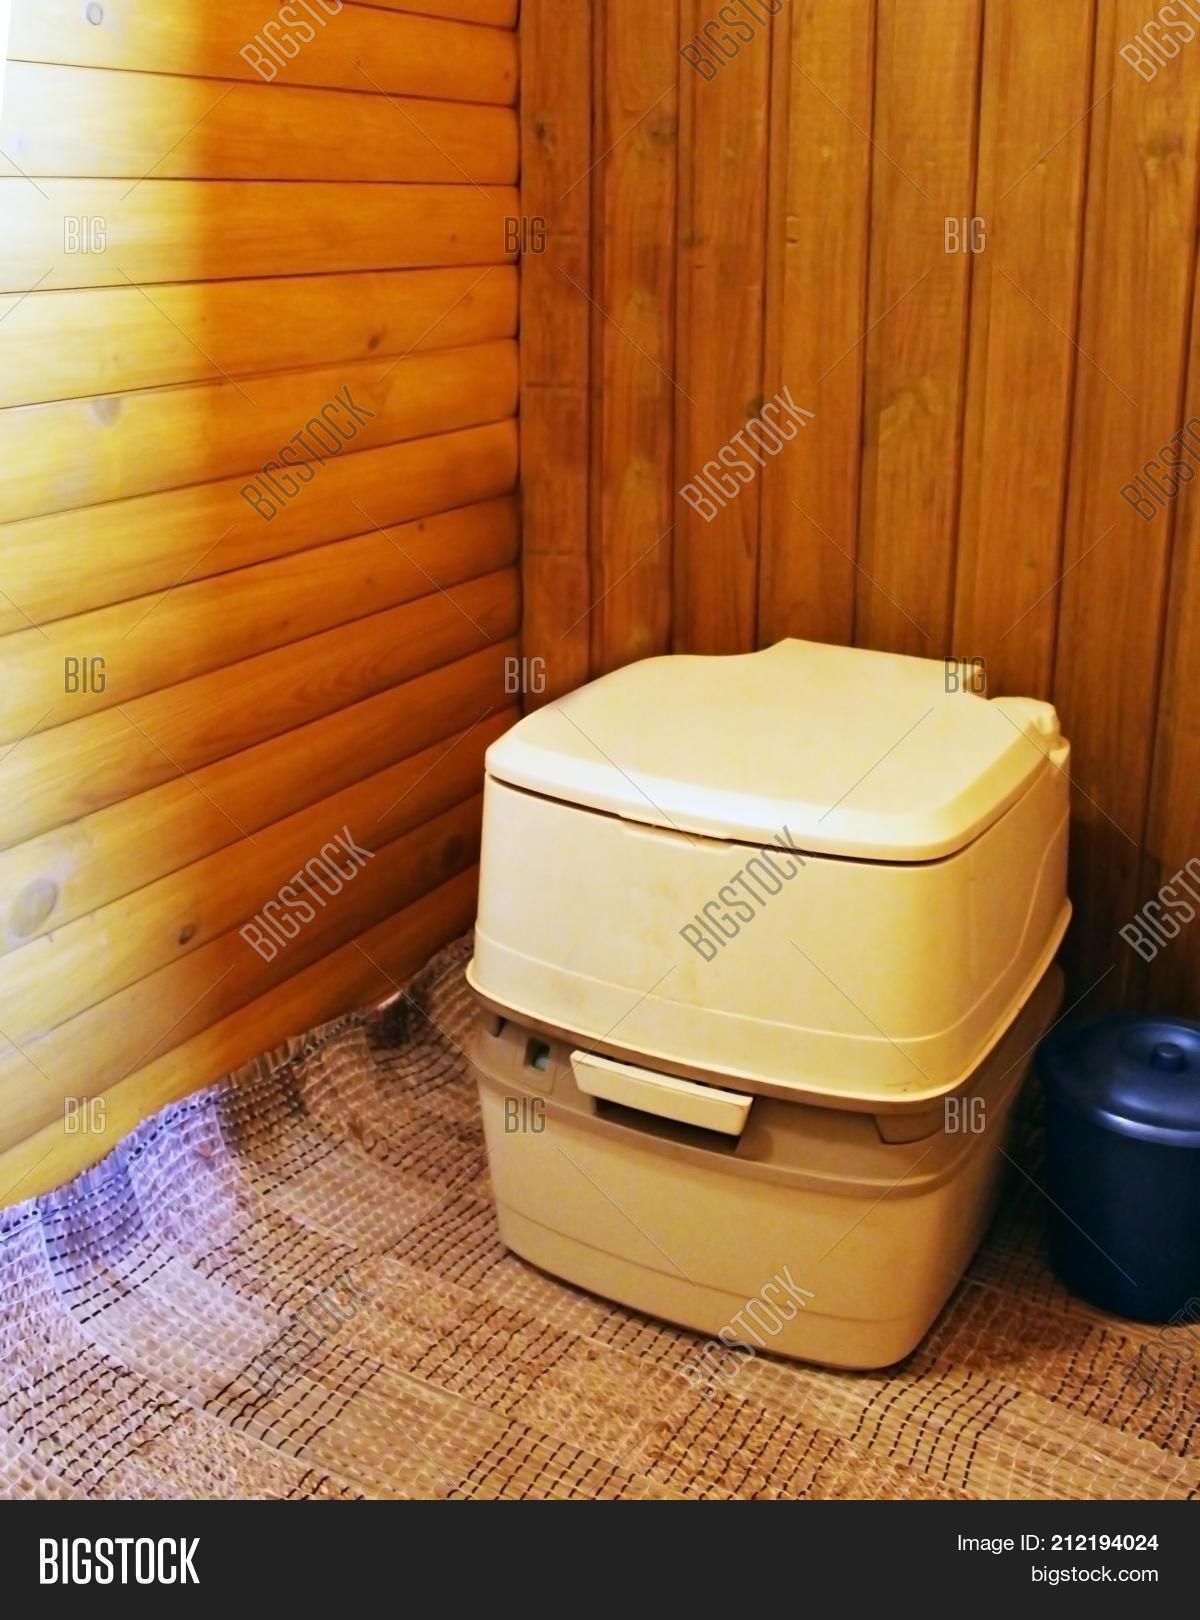 Portable Toilet Exhibition : Portable chemical image & photo free trial bigstock